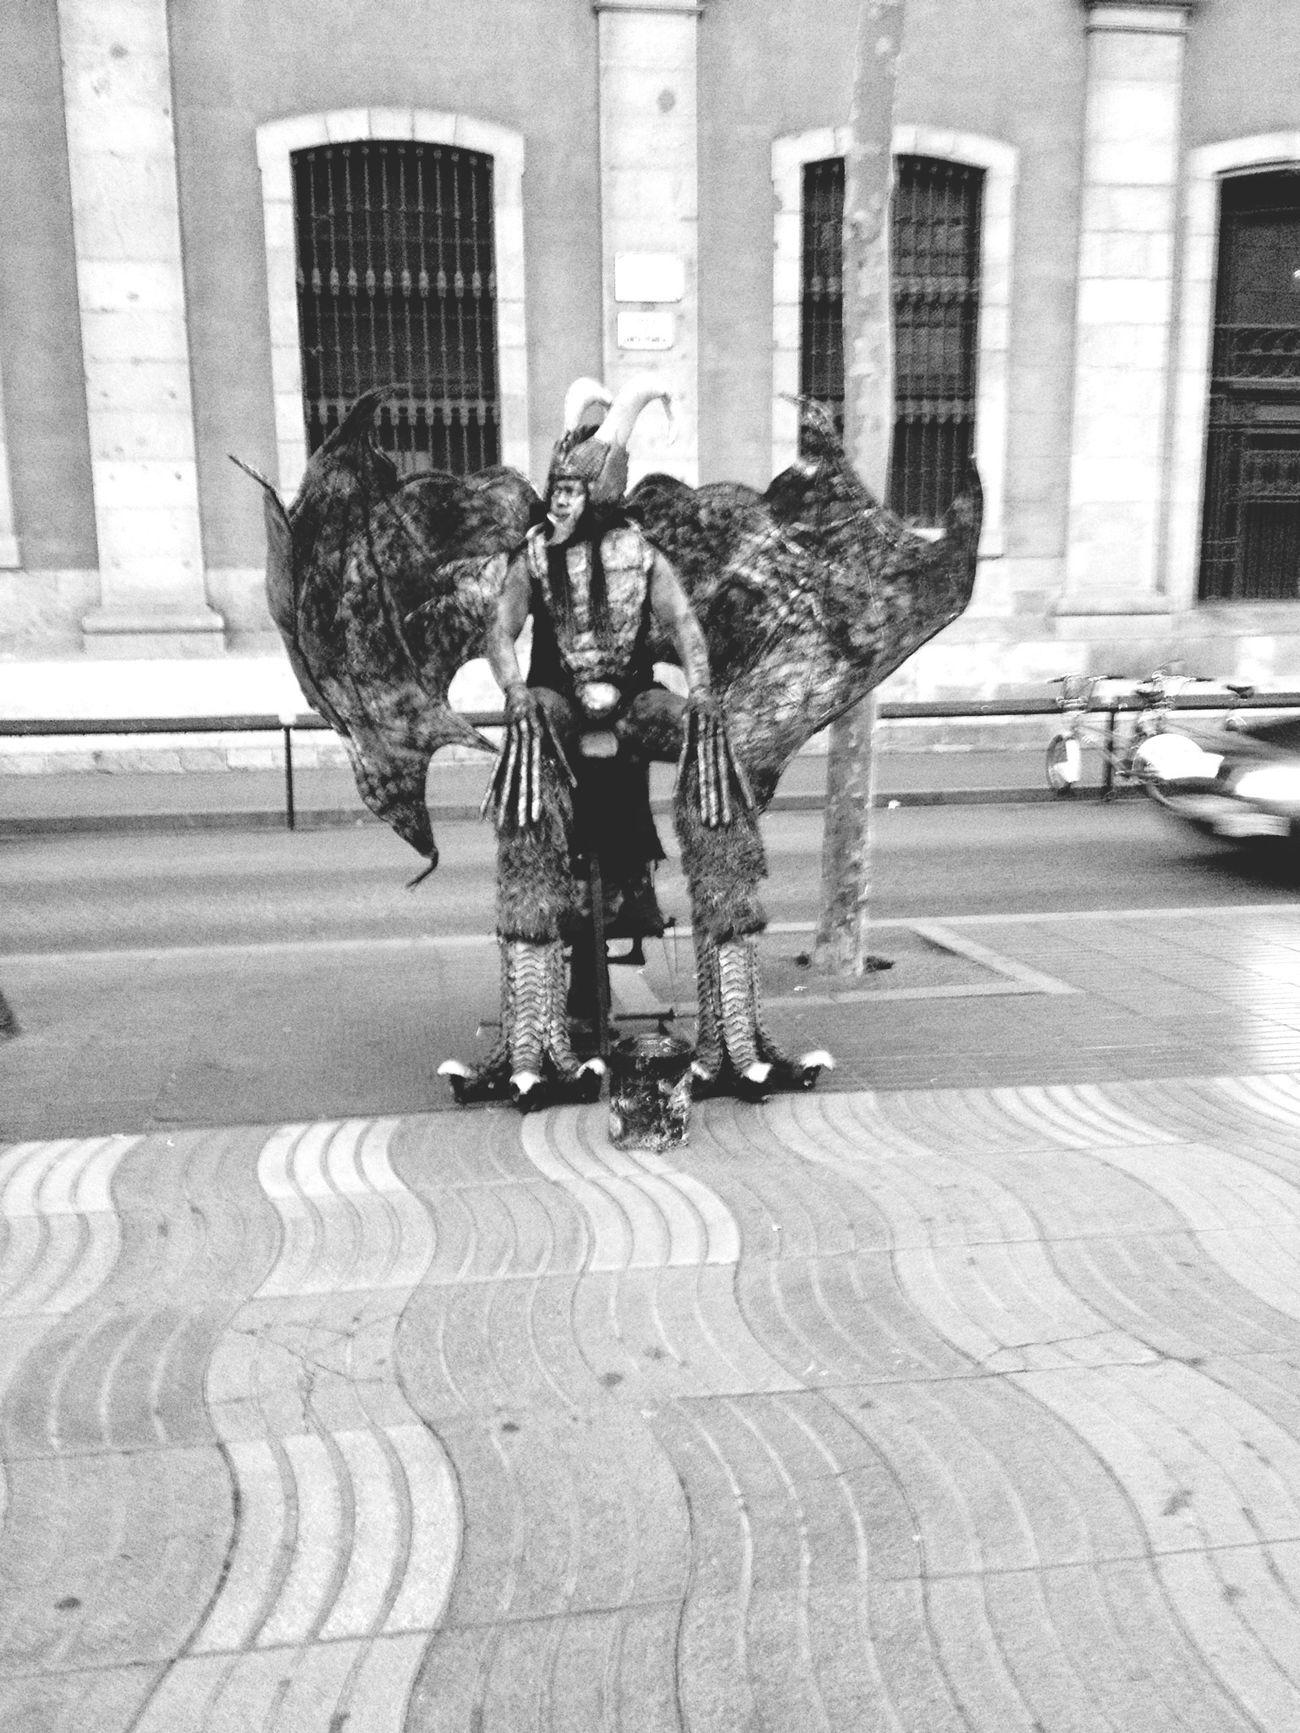 Street Photography Cities Barcelona Street Art